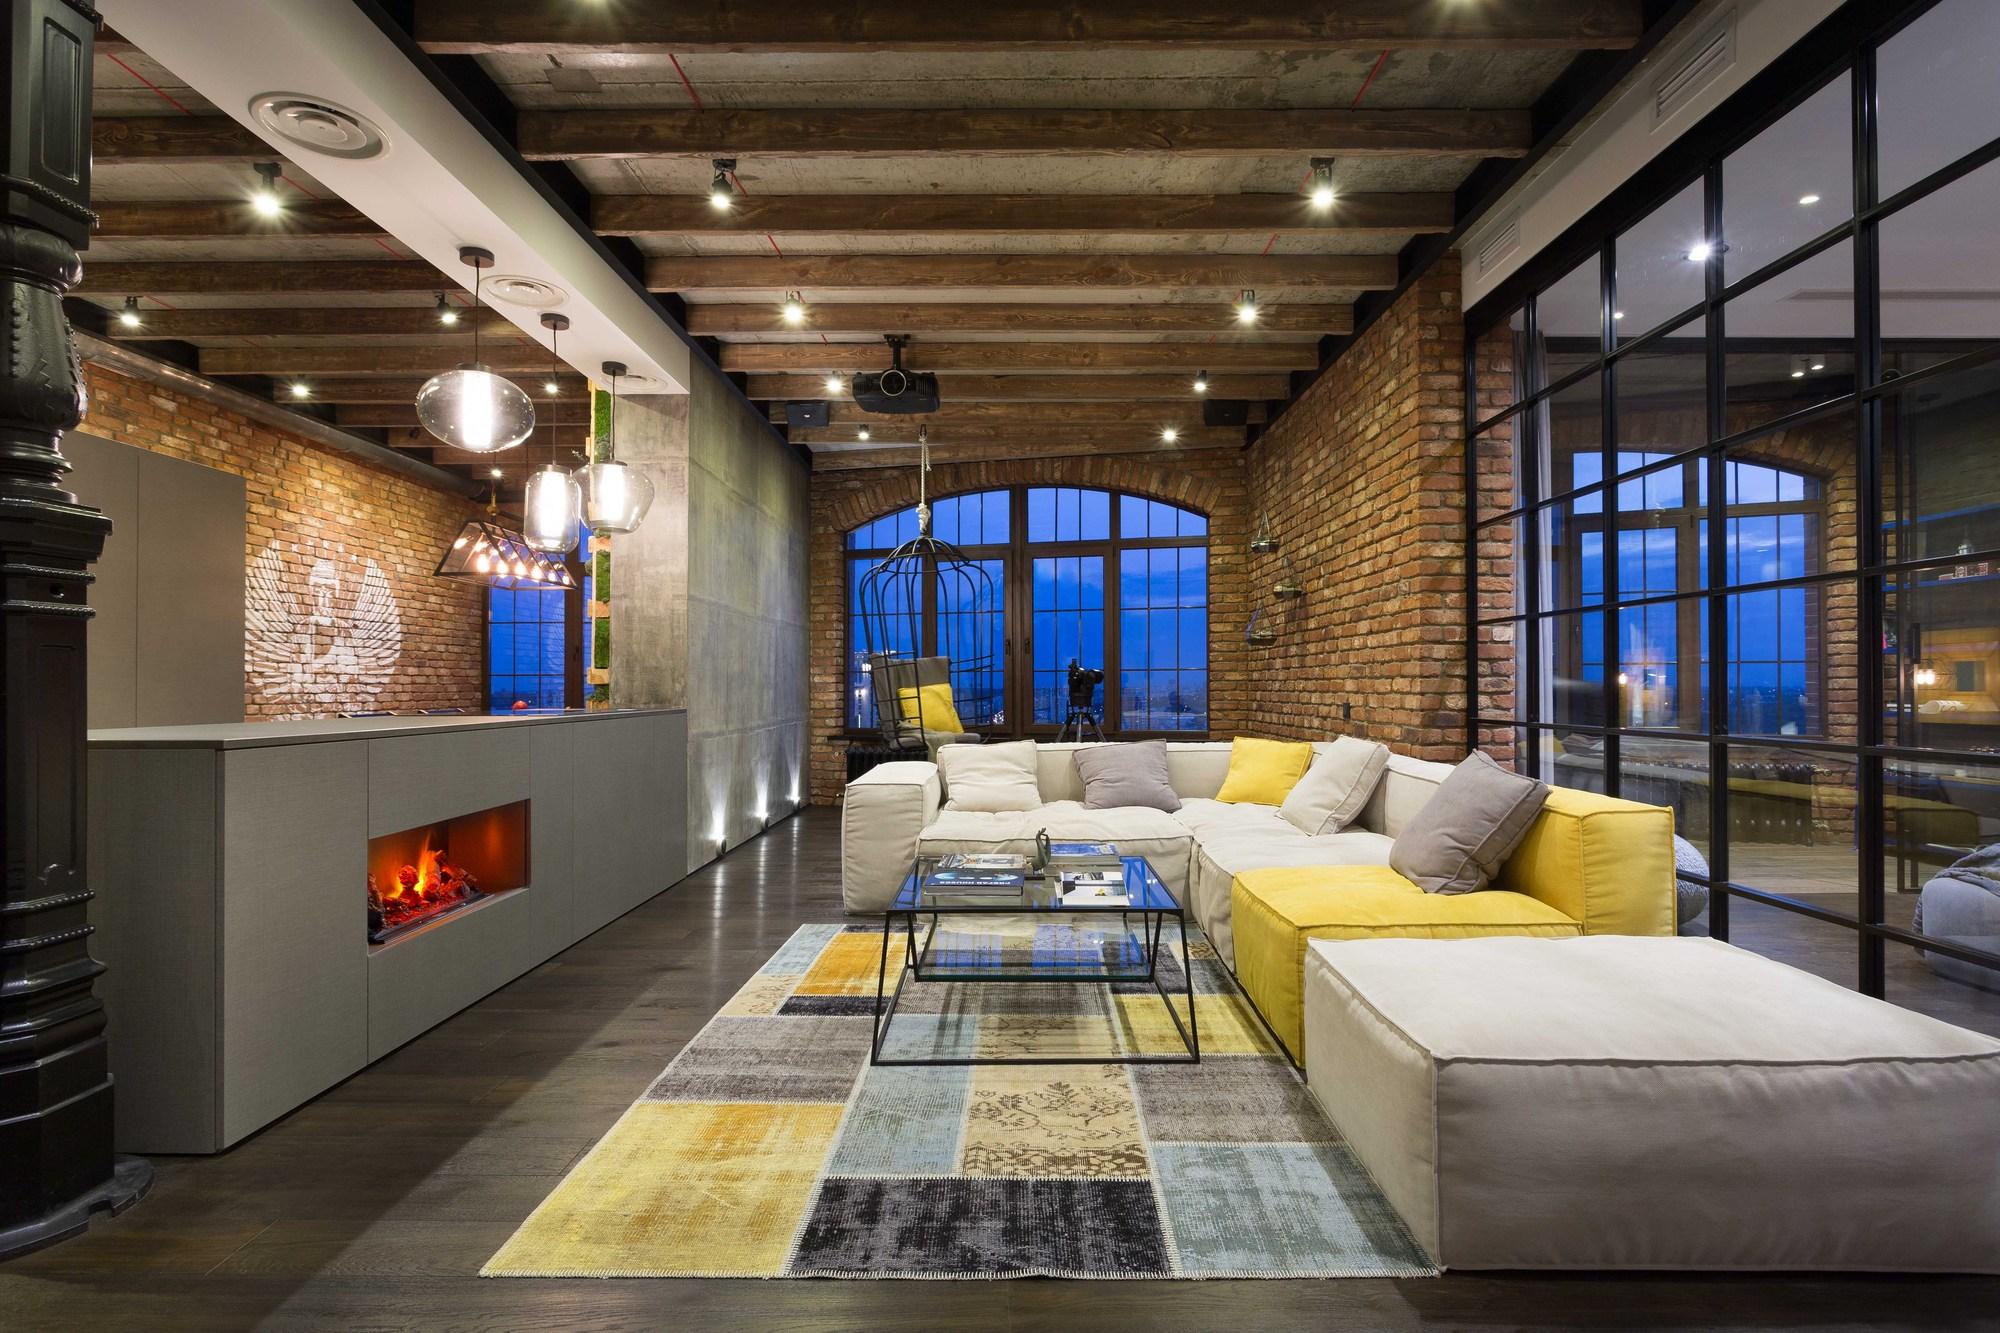 Gallery of loft in kyiv martinarchitects 23 - Loft industriel martin architectes kiev ...